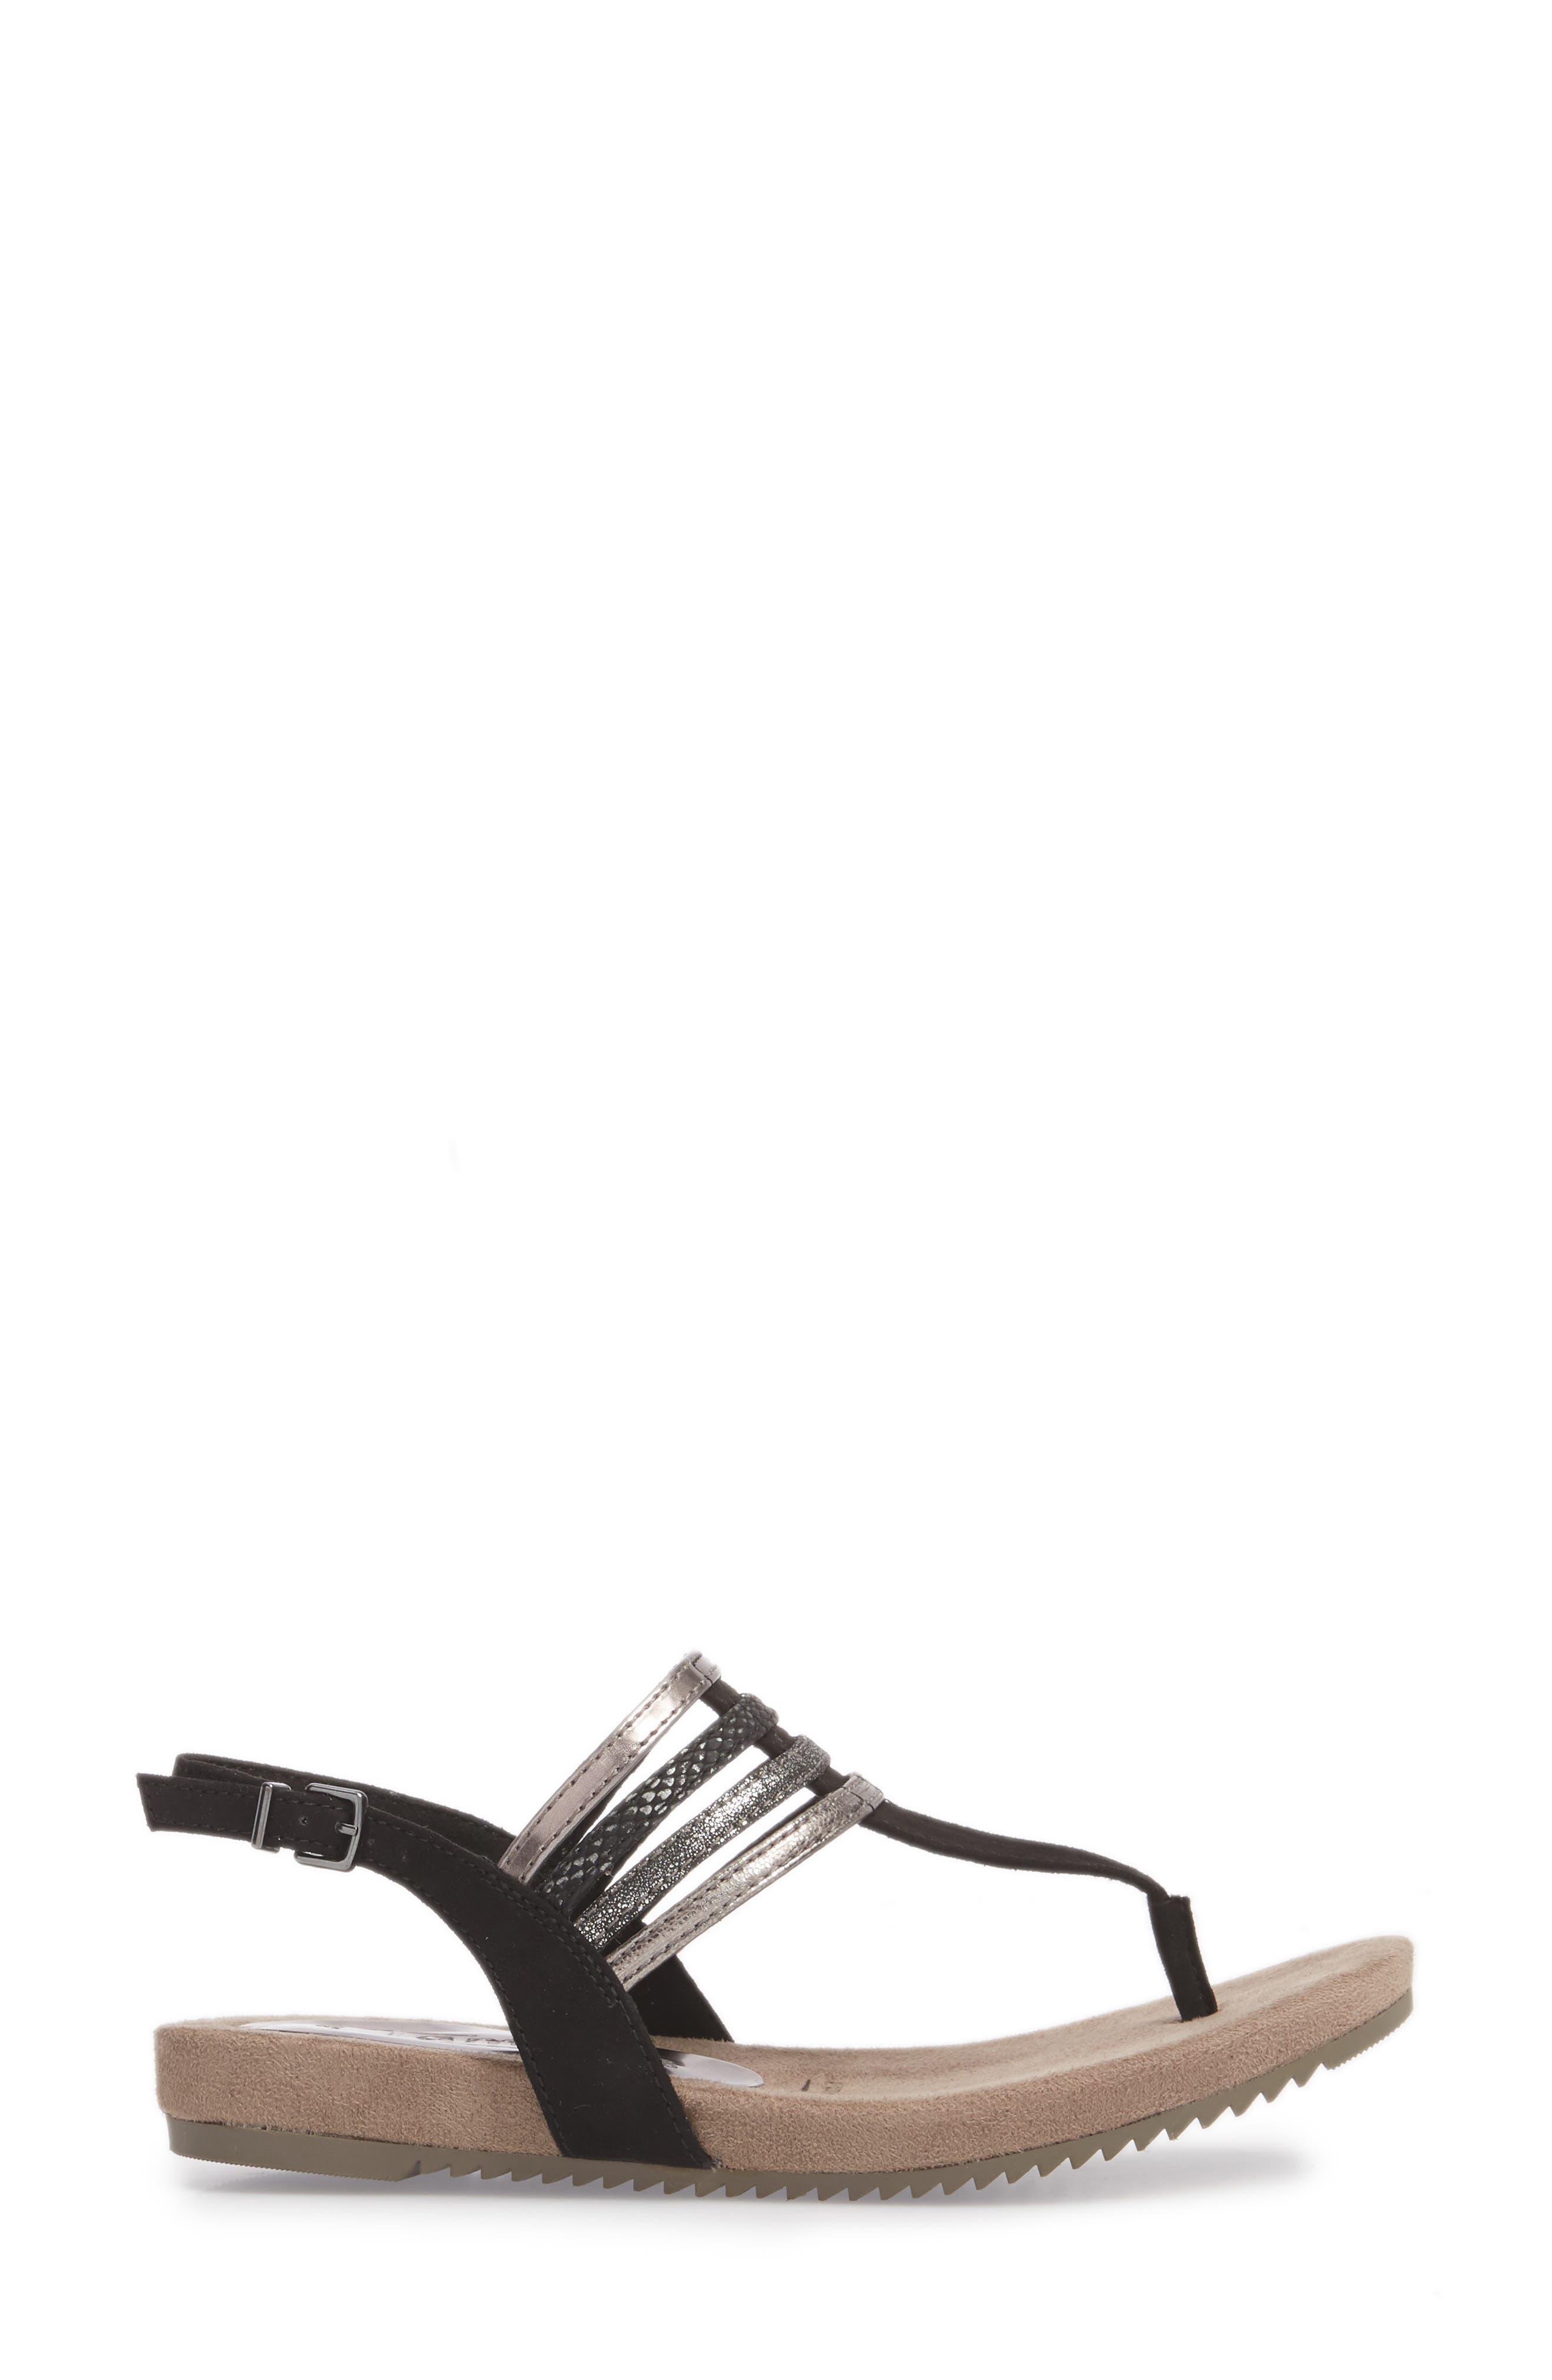 Locust Sandal,                             Alternate thumbnail 3, color,                             Black Fabric